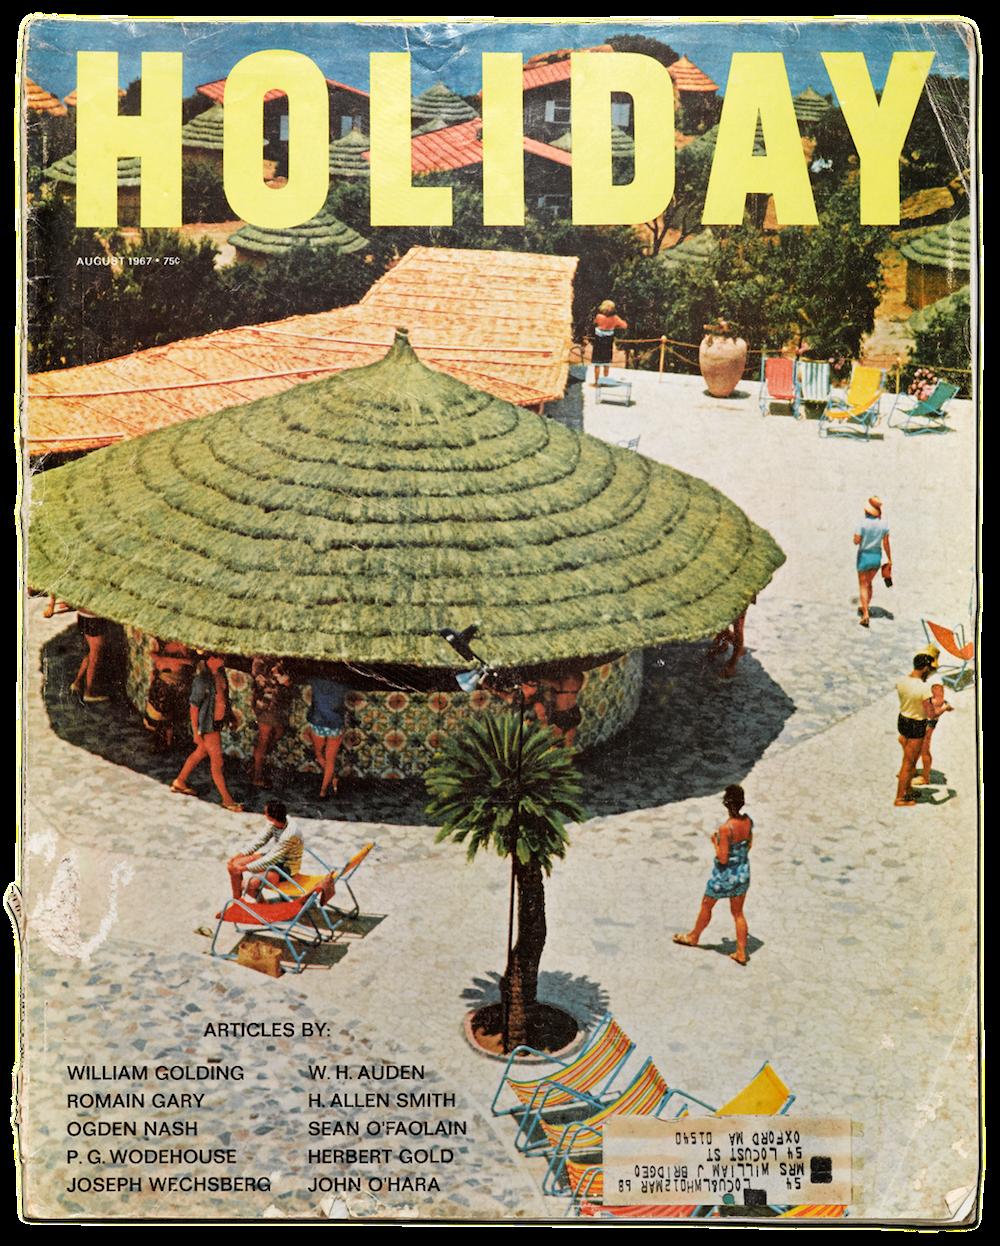 Seems vintage holiday pics